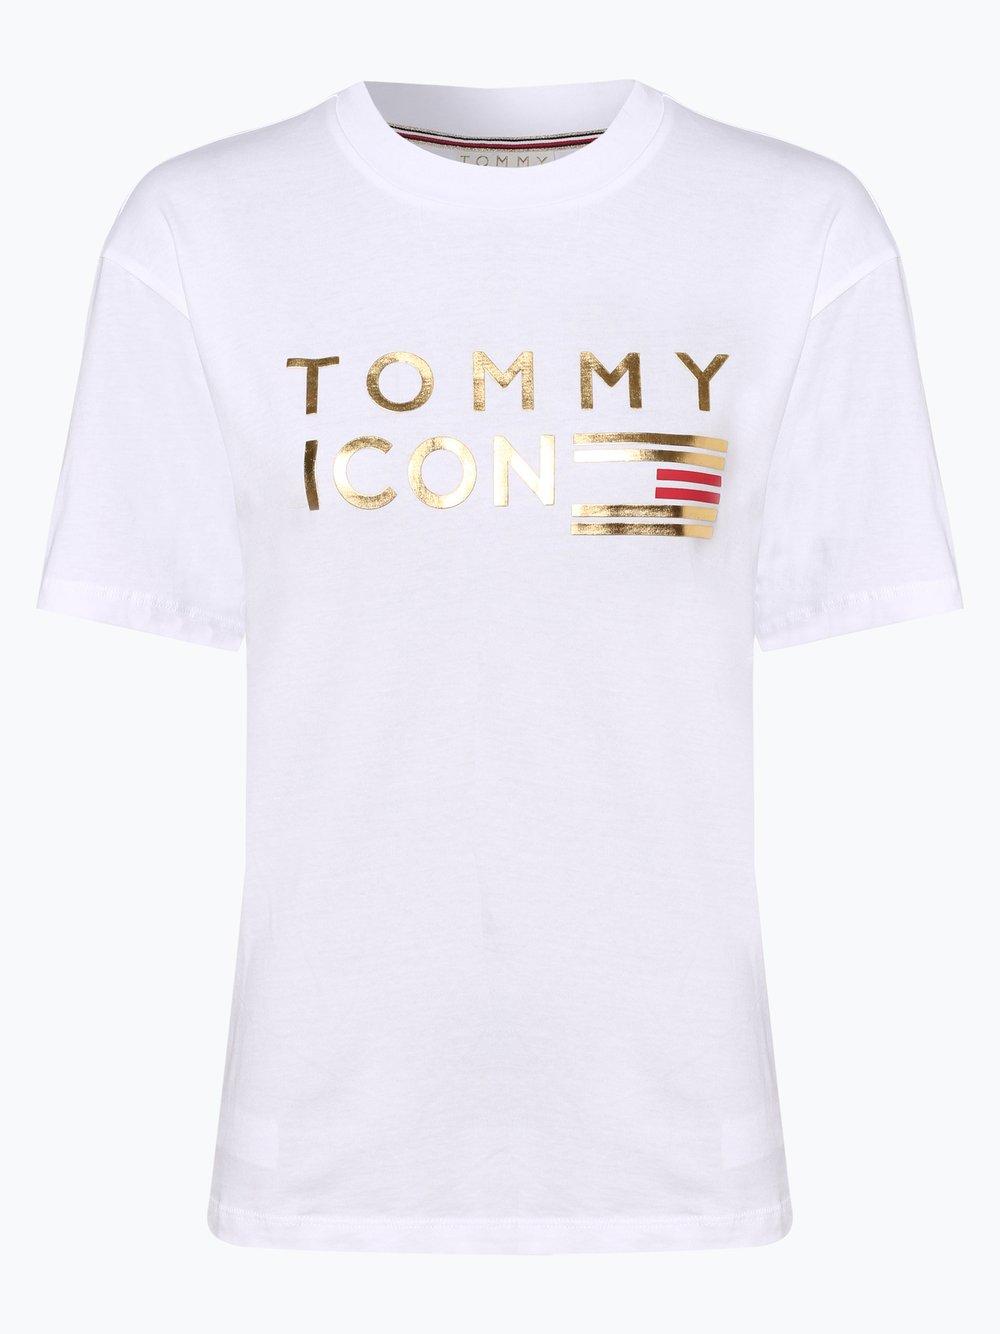 72241aea465ab Tommy Hilfiger T-shirt damski kup online